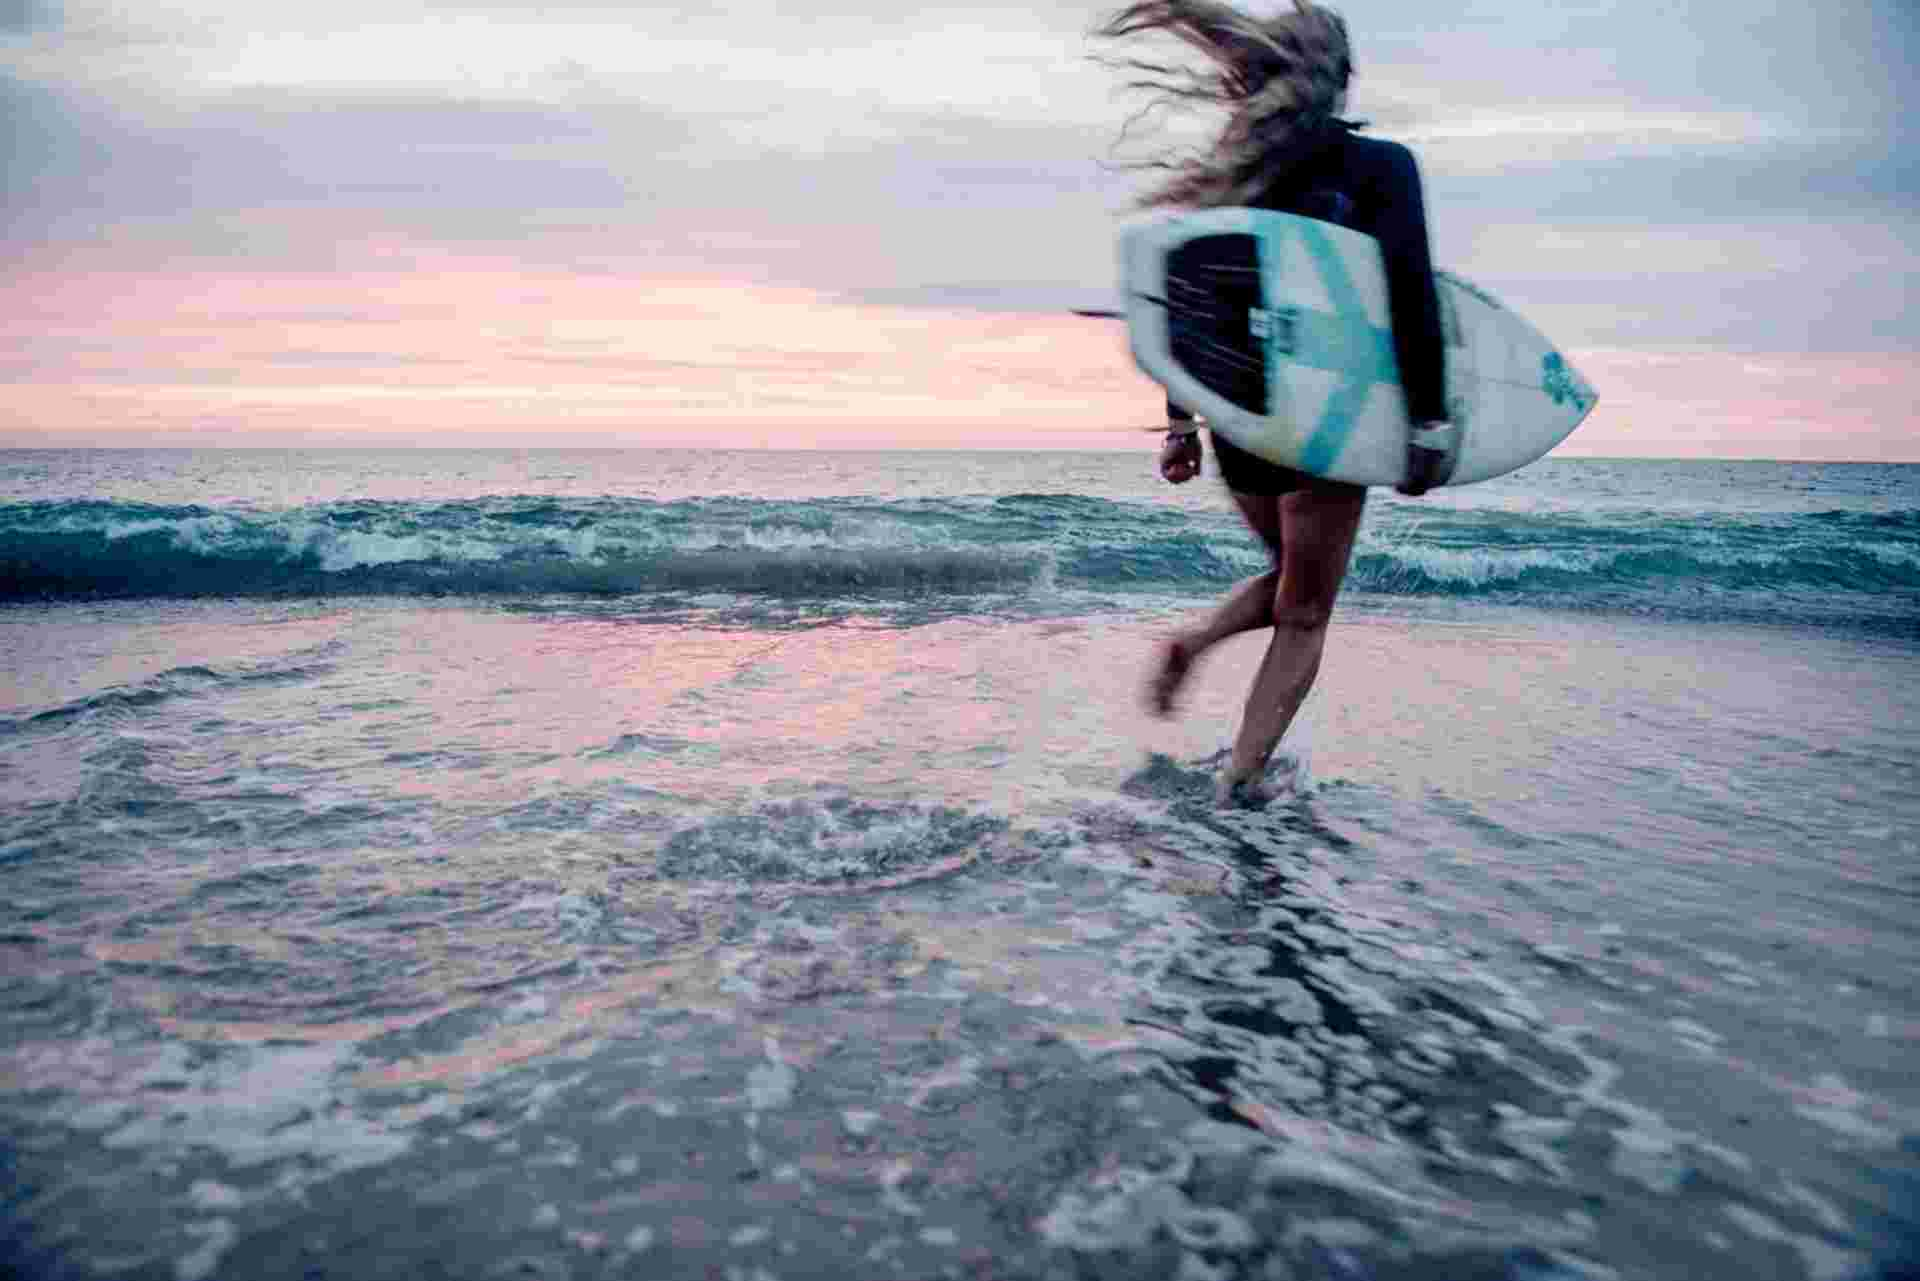 Klitmøller Cold Hawaii Surfing